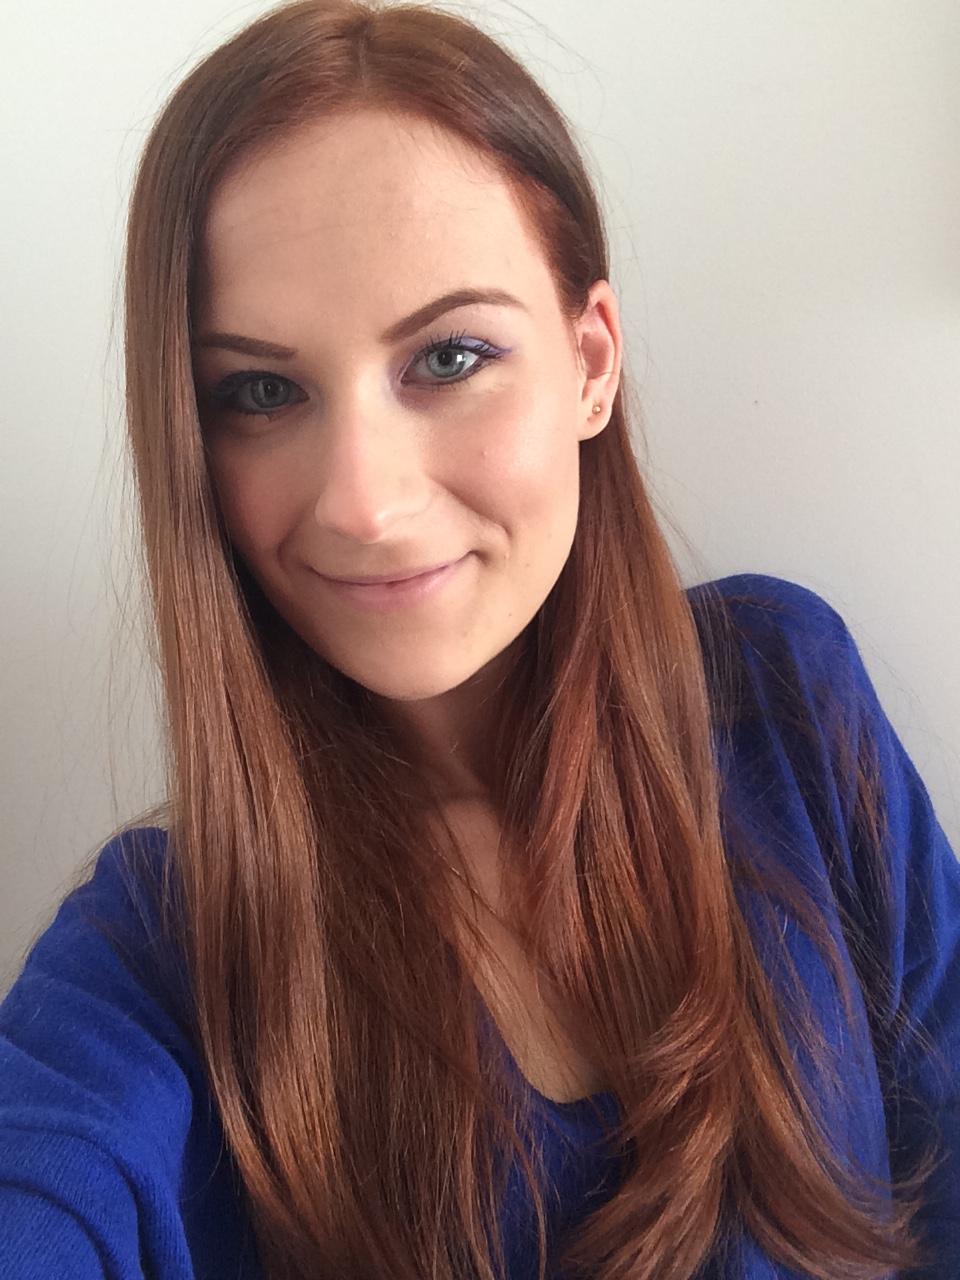 Red Hair Victoria Fedorova